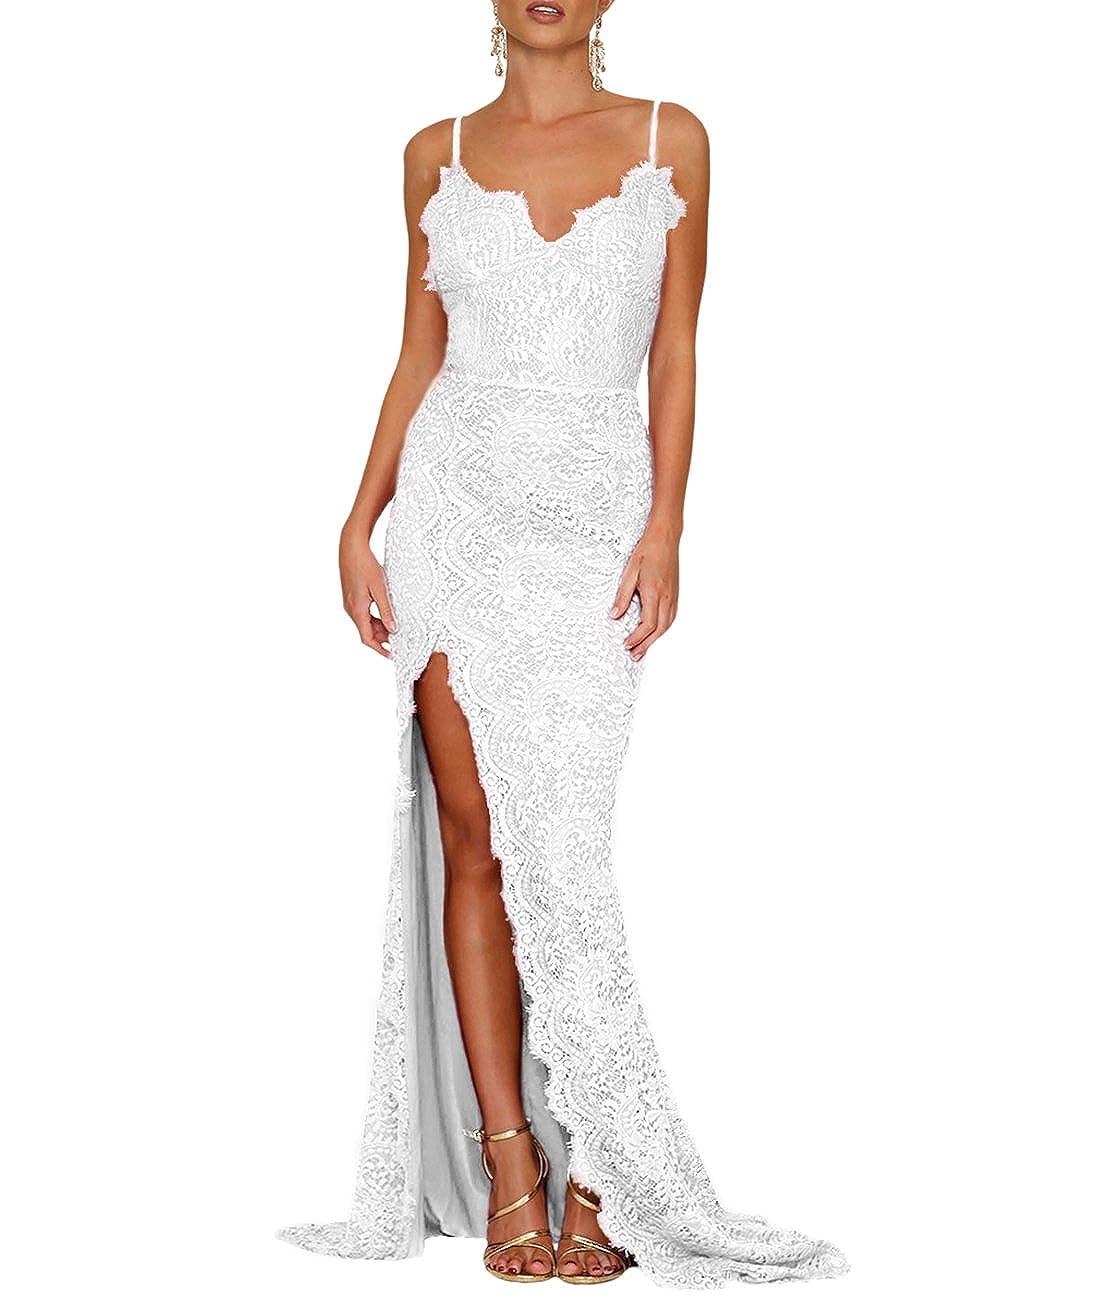 Prom Dresses Marshalls Department Store – DACC